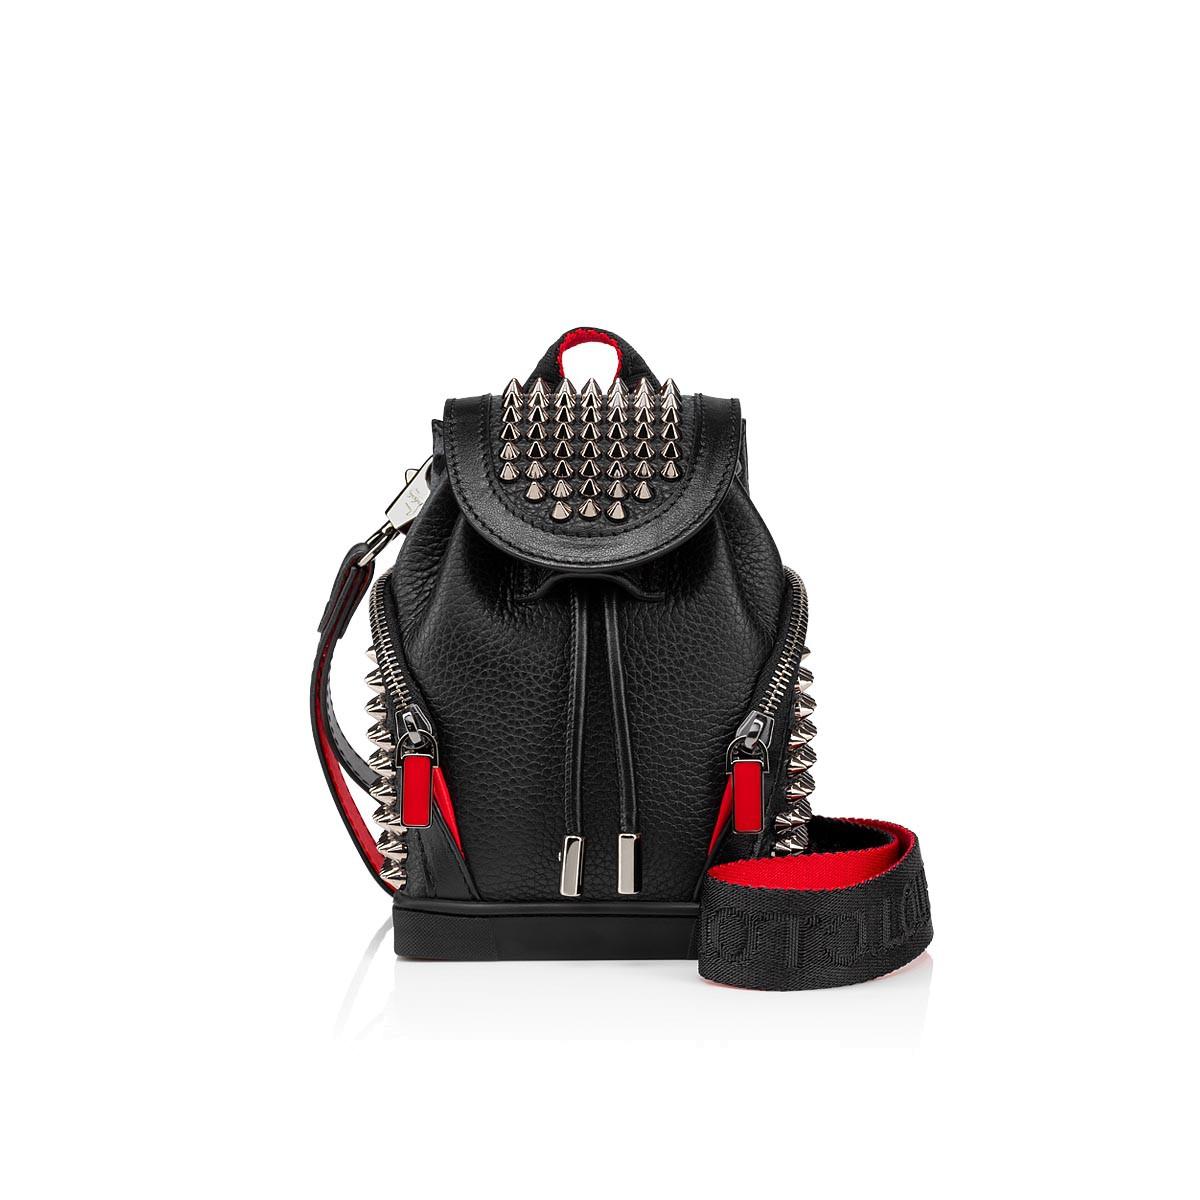 Small Leather Goods - Explorafunk Keyring - Christian Louboutin